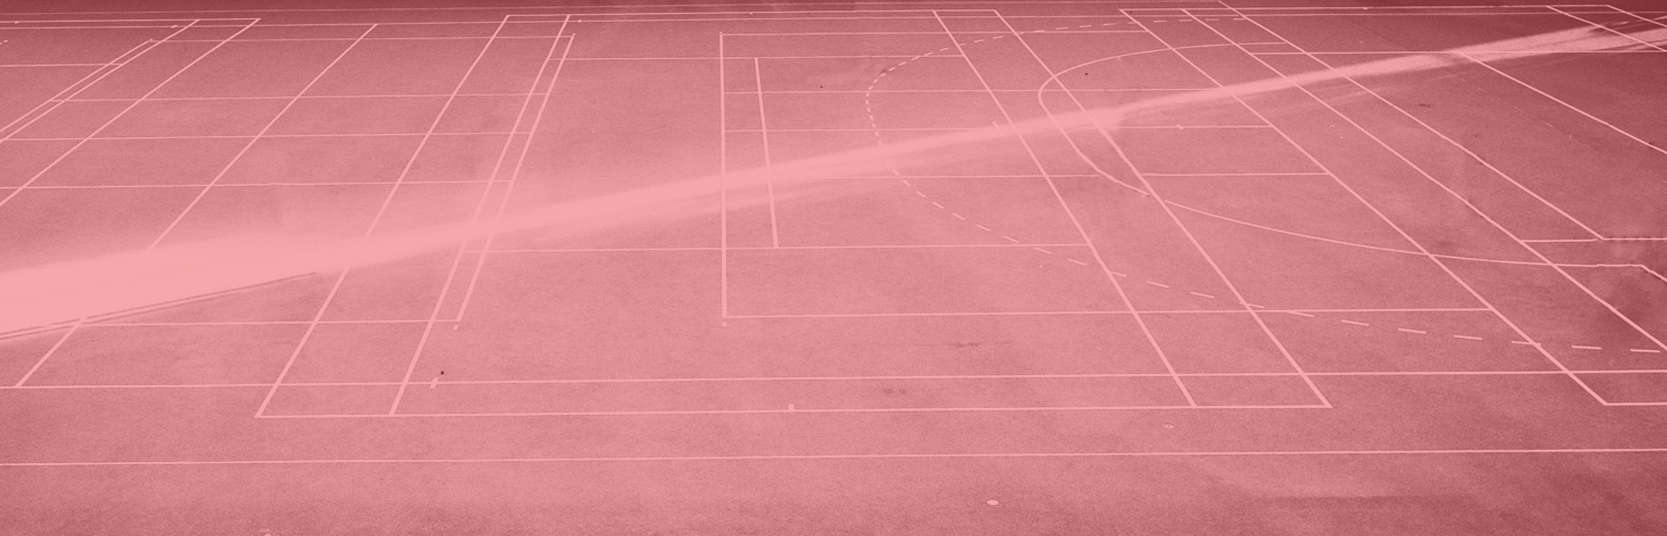 ExtraClub le logiciel de gestion de club de sport du groupe StadLine - Fond